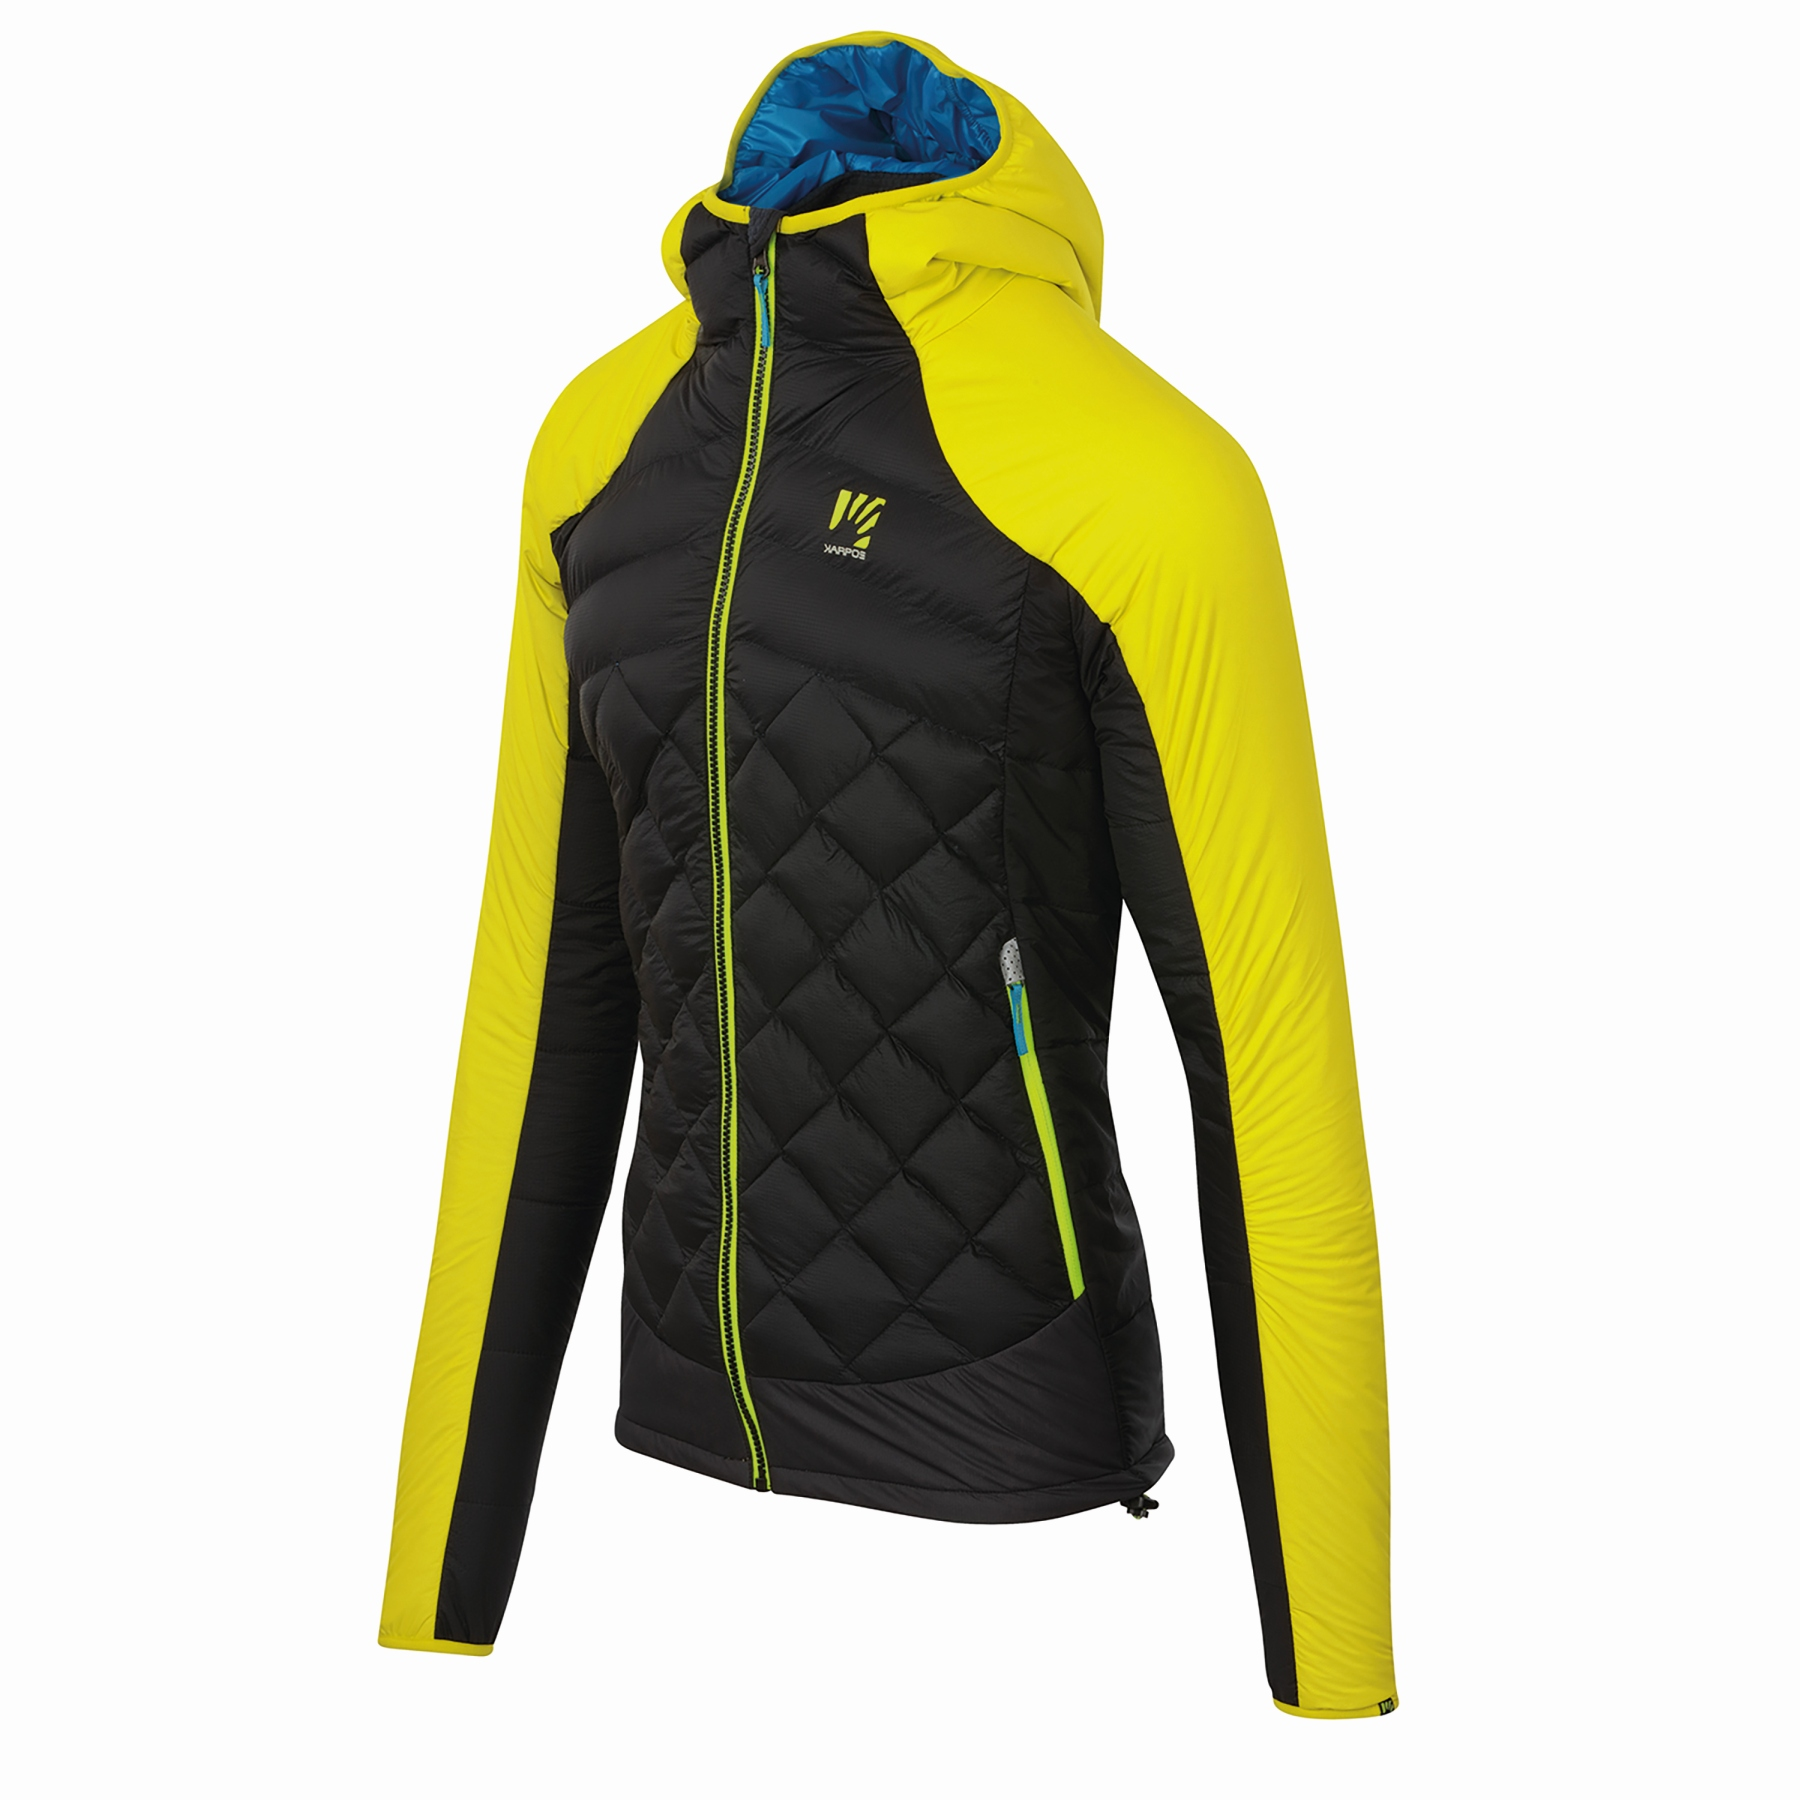 Image of Karpos Lastei Active Plus Jacket - Sulphur Spring/Black